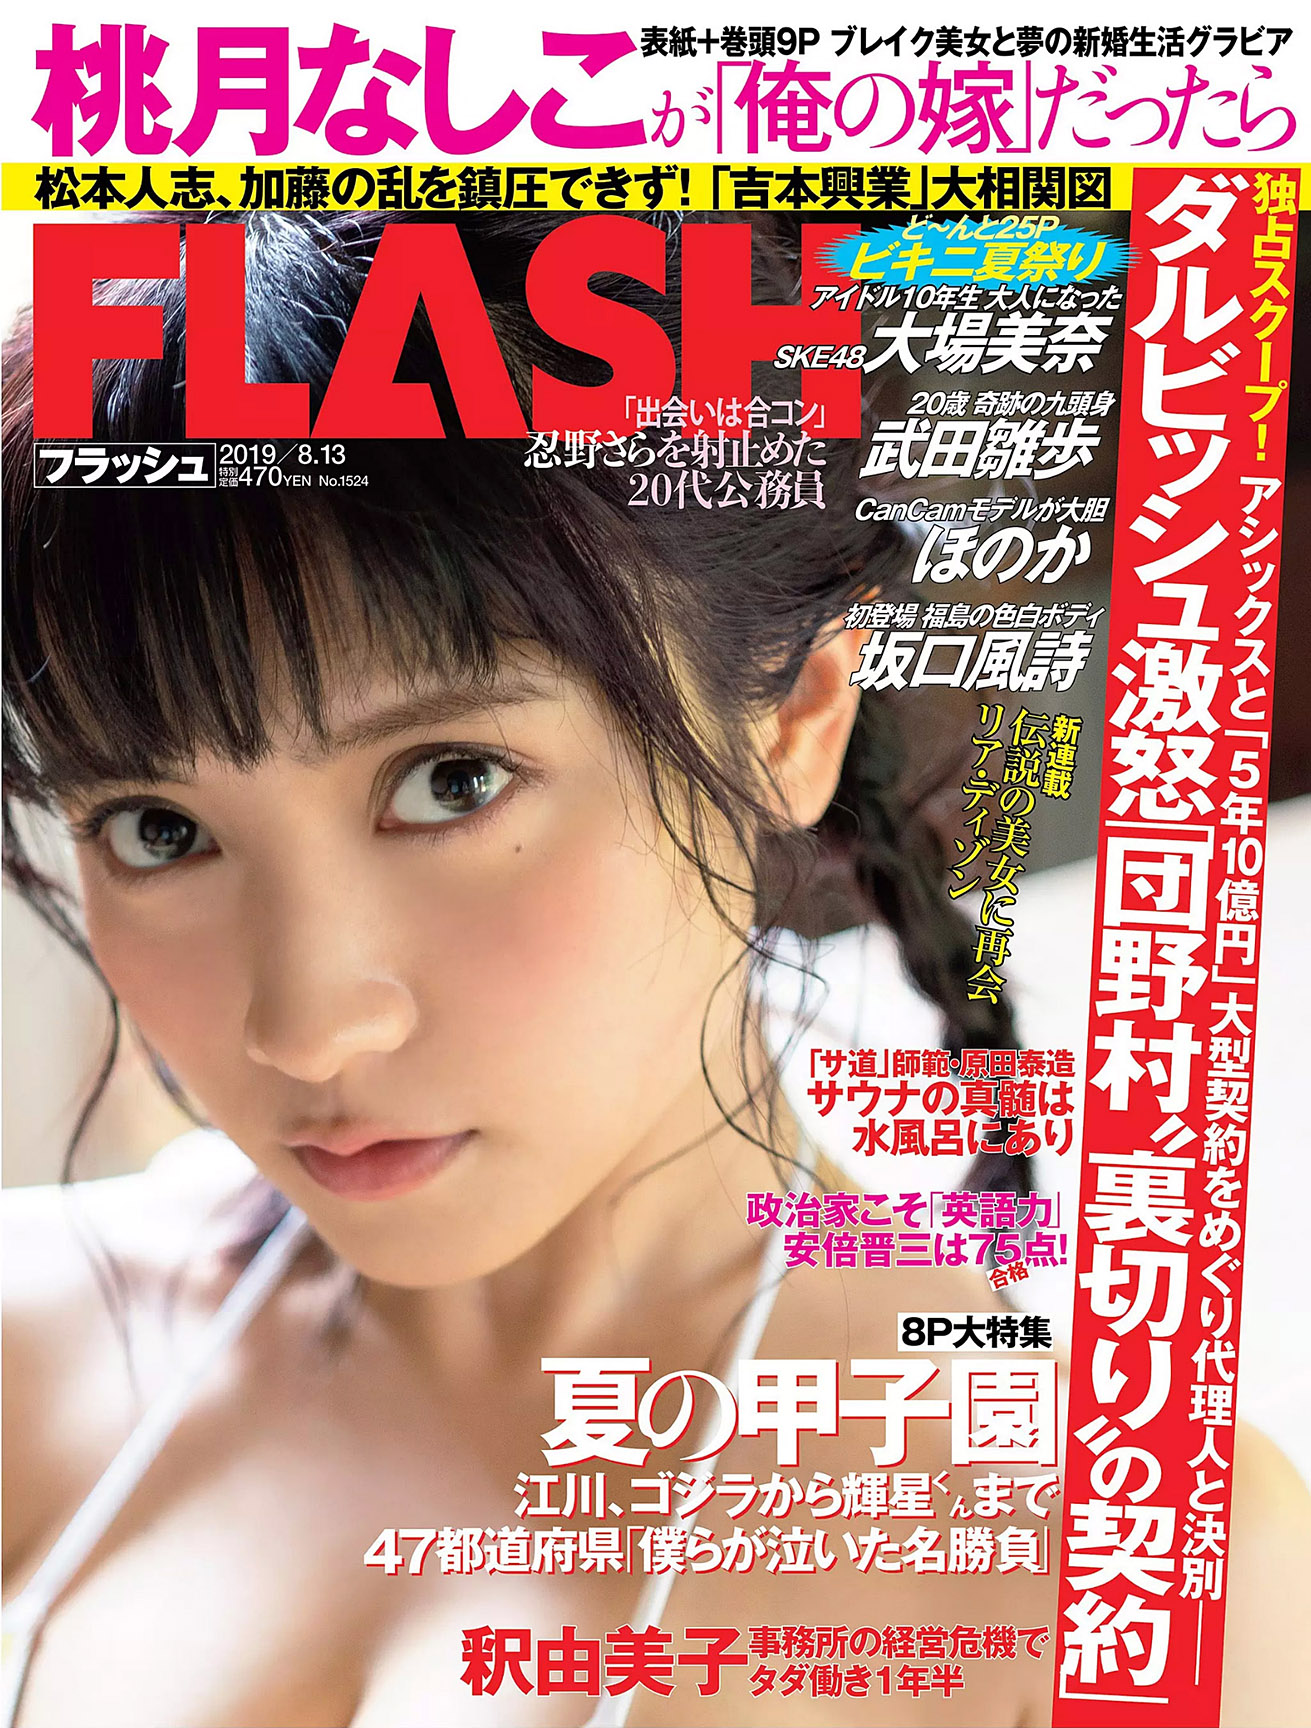 Naoko Momotsuki Flash 190813 01.jpg